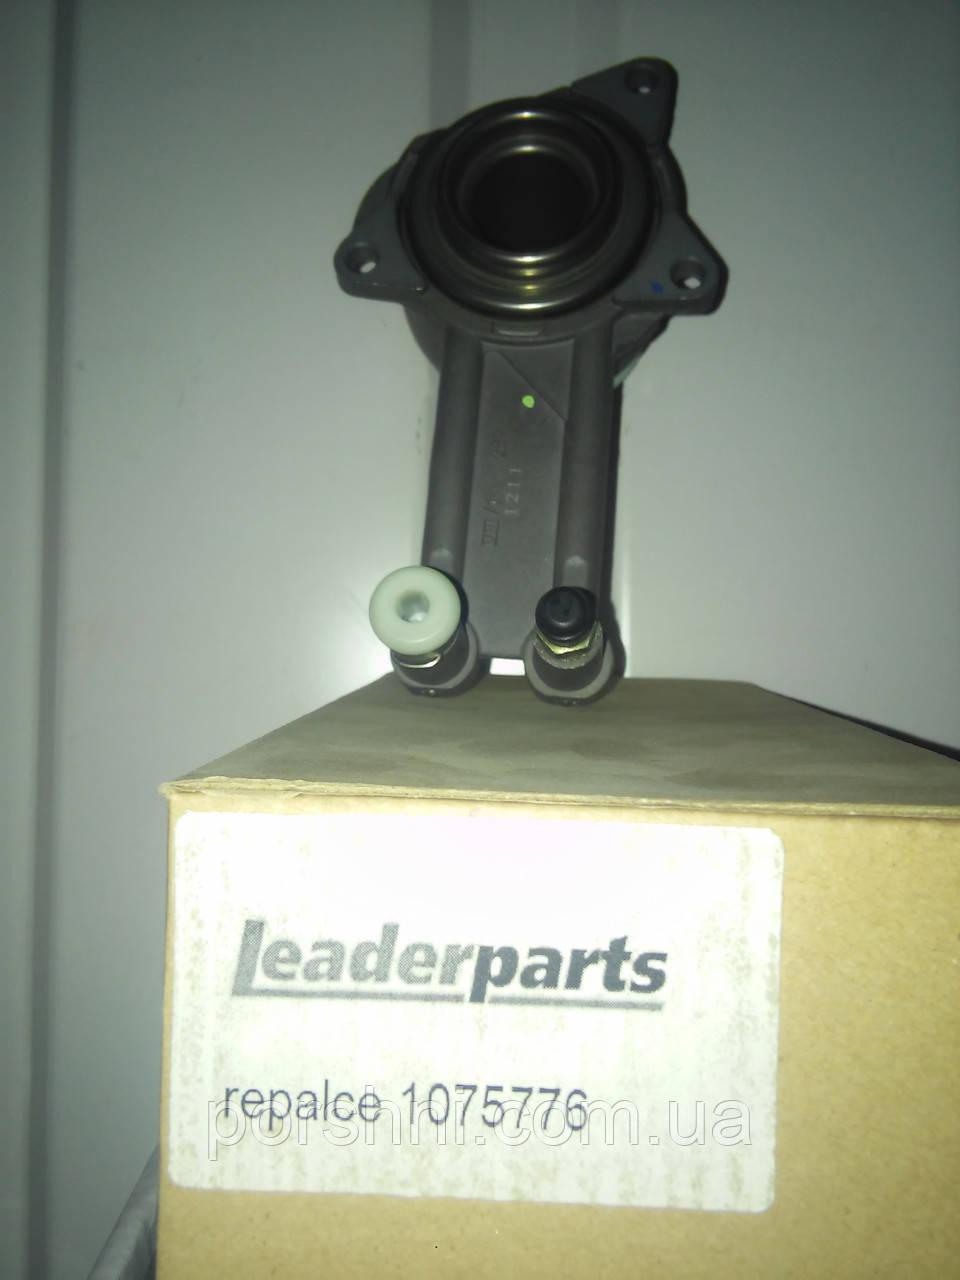 Подшипник включения сцепления Ford Fiesta  95 --  гидр. Focus I  98 --  LEADERPARTS  1075776